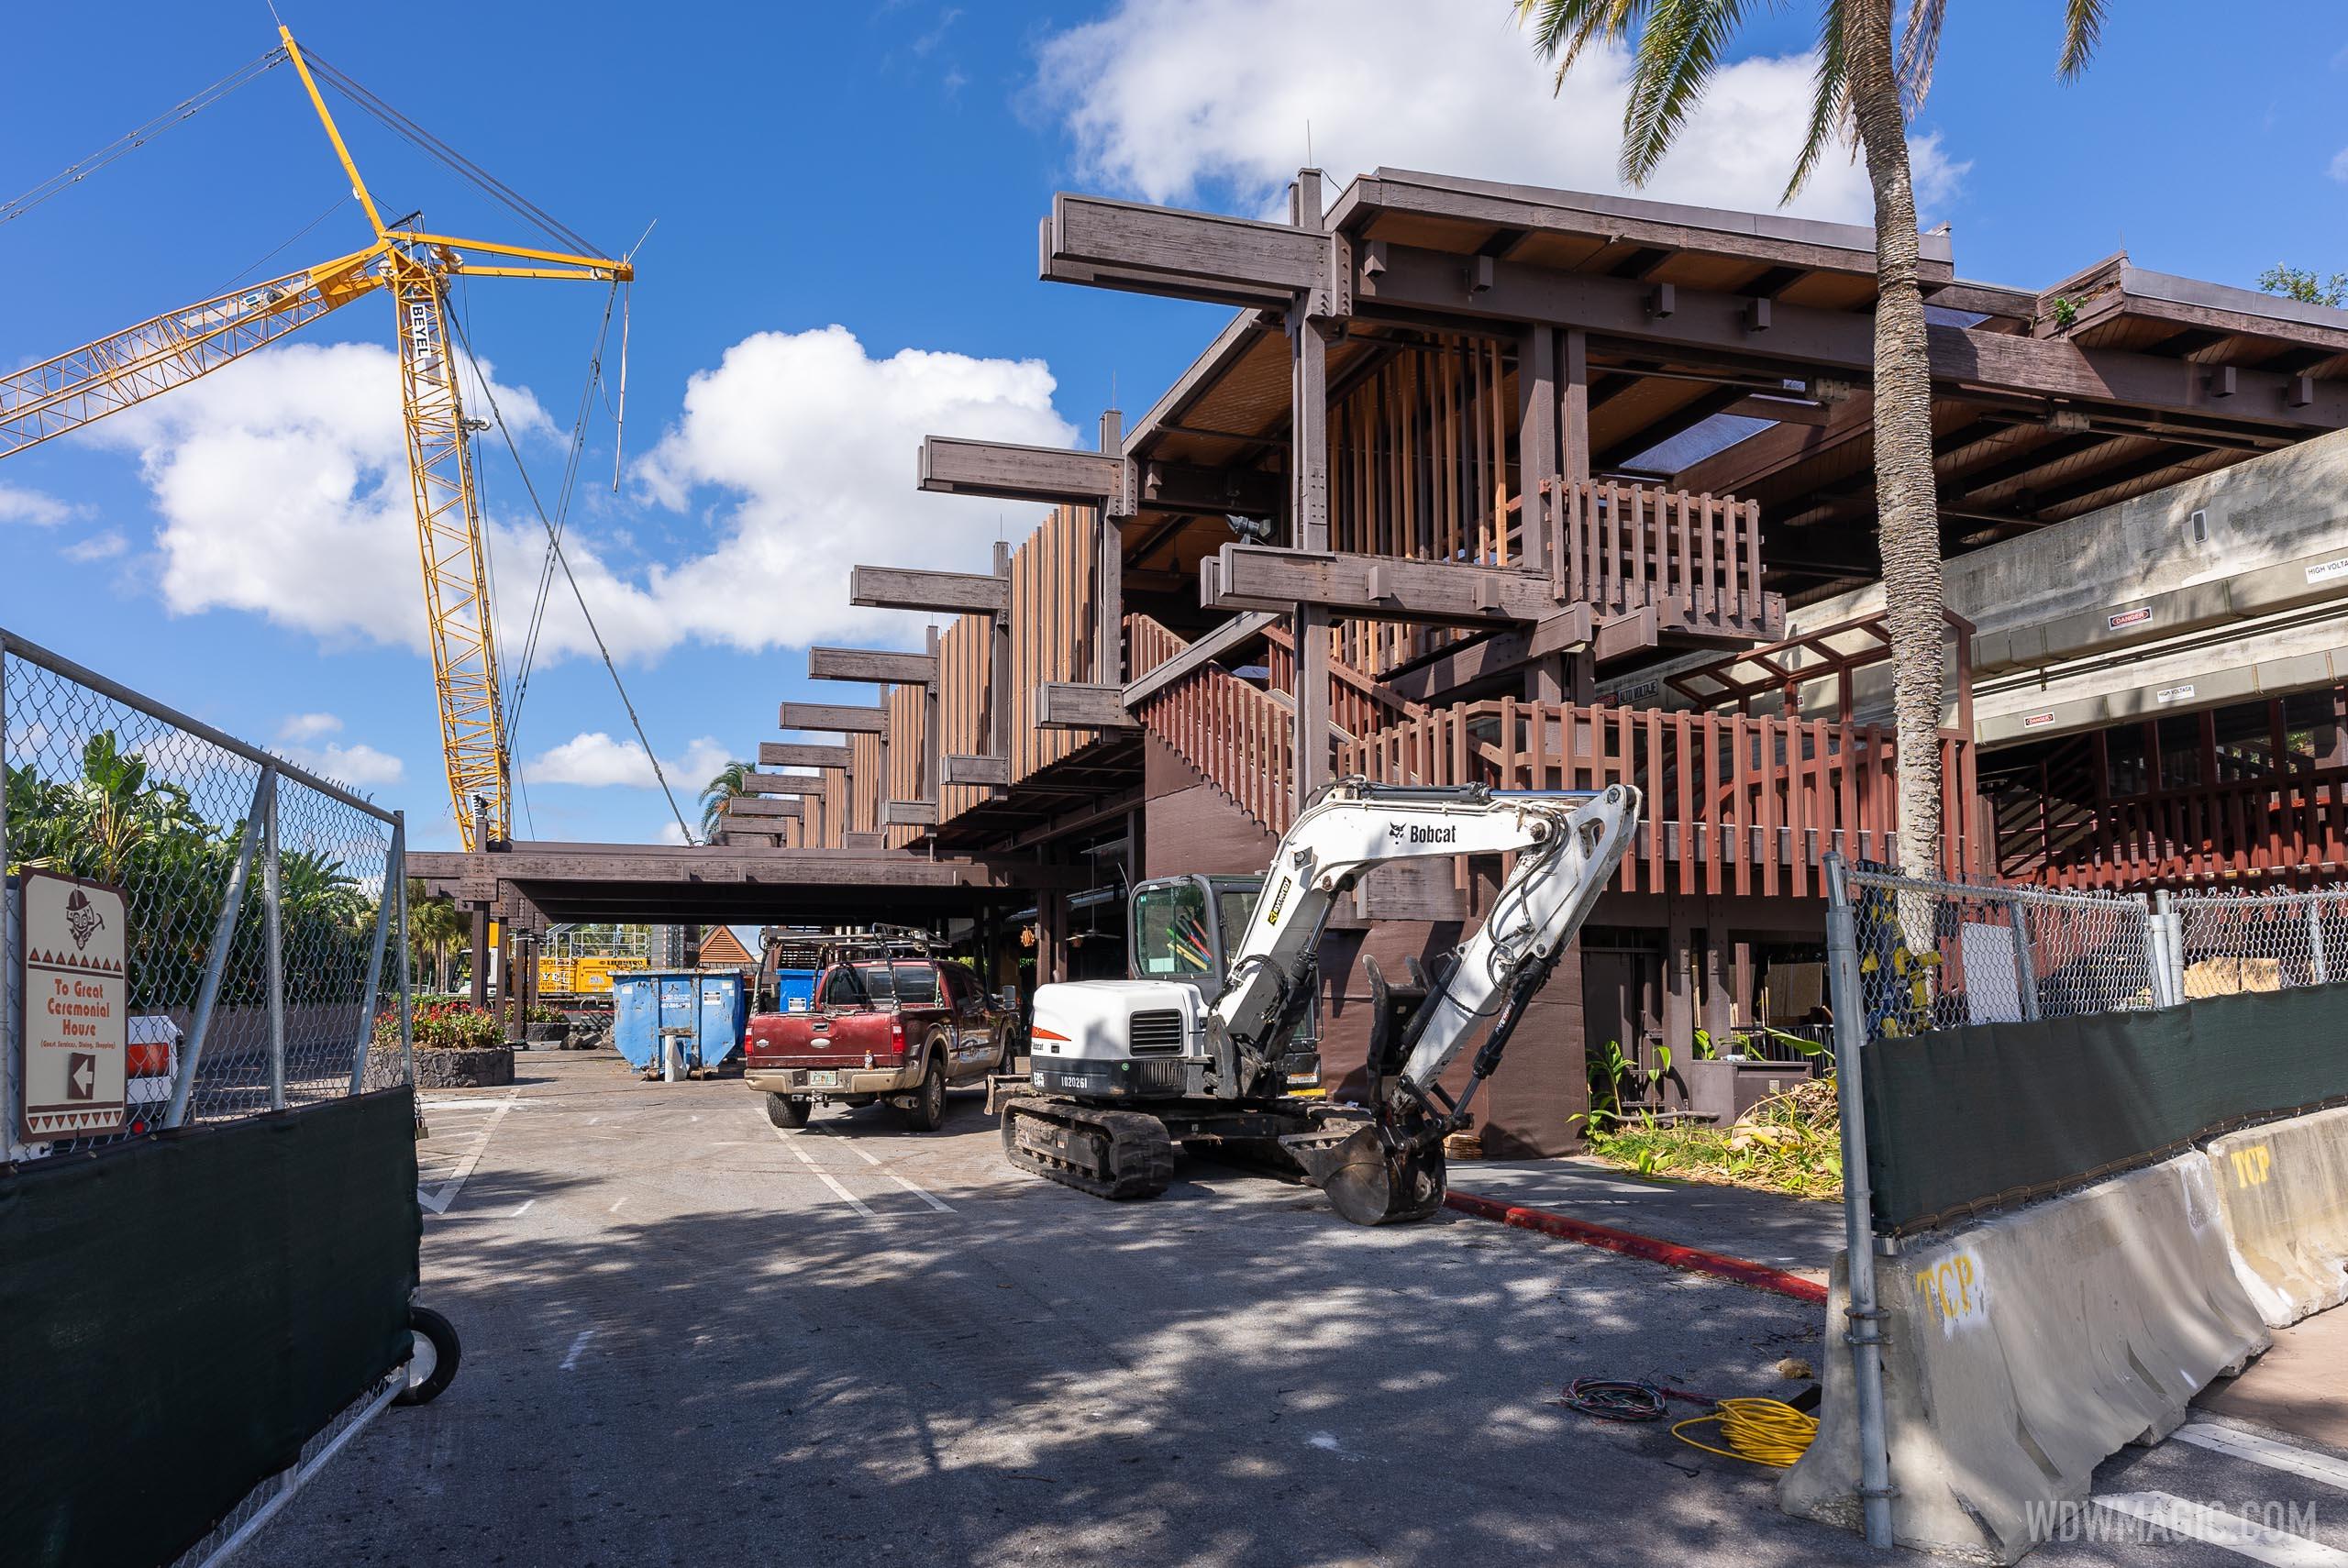 PHOTOS - Latest refurbishment progress at Disney's Polynesian Resort